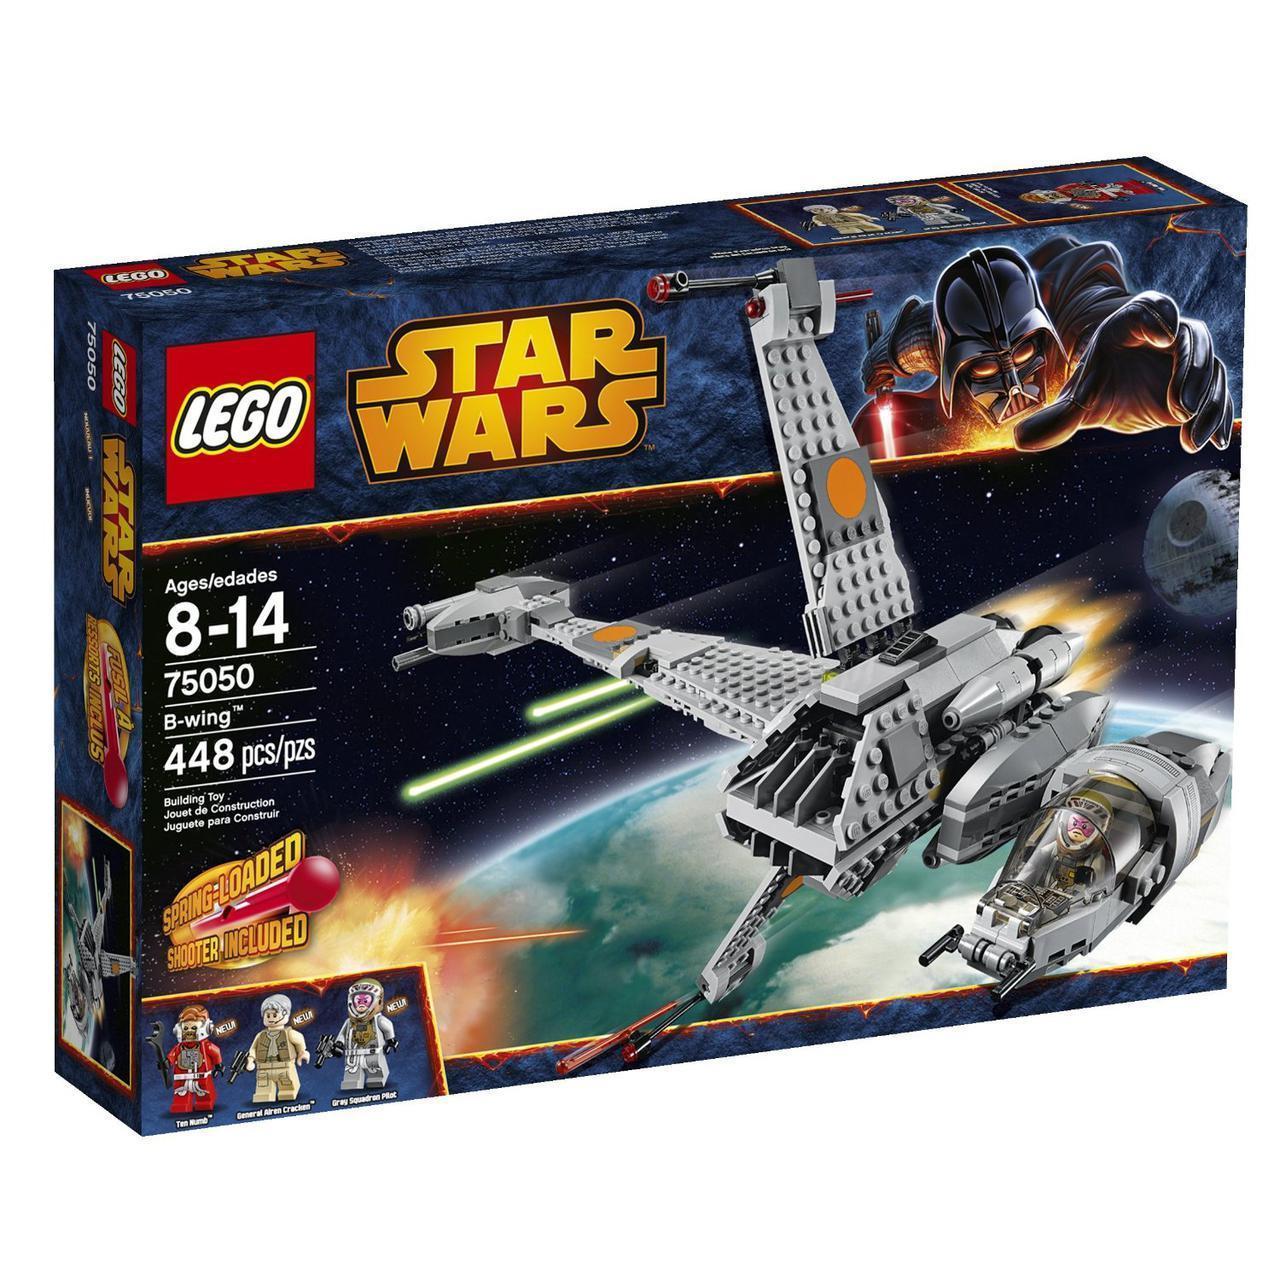 Lego Star Wars Истребитель B-Wing 75050